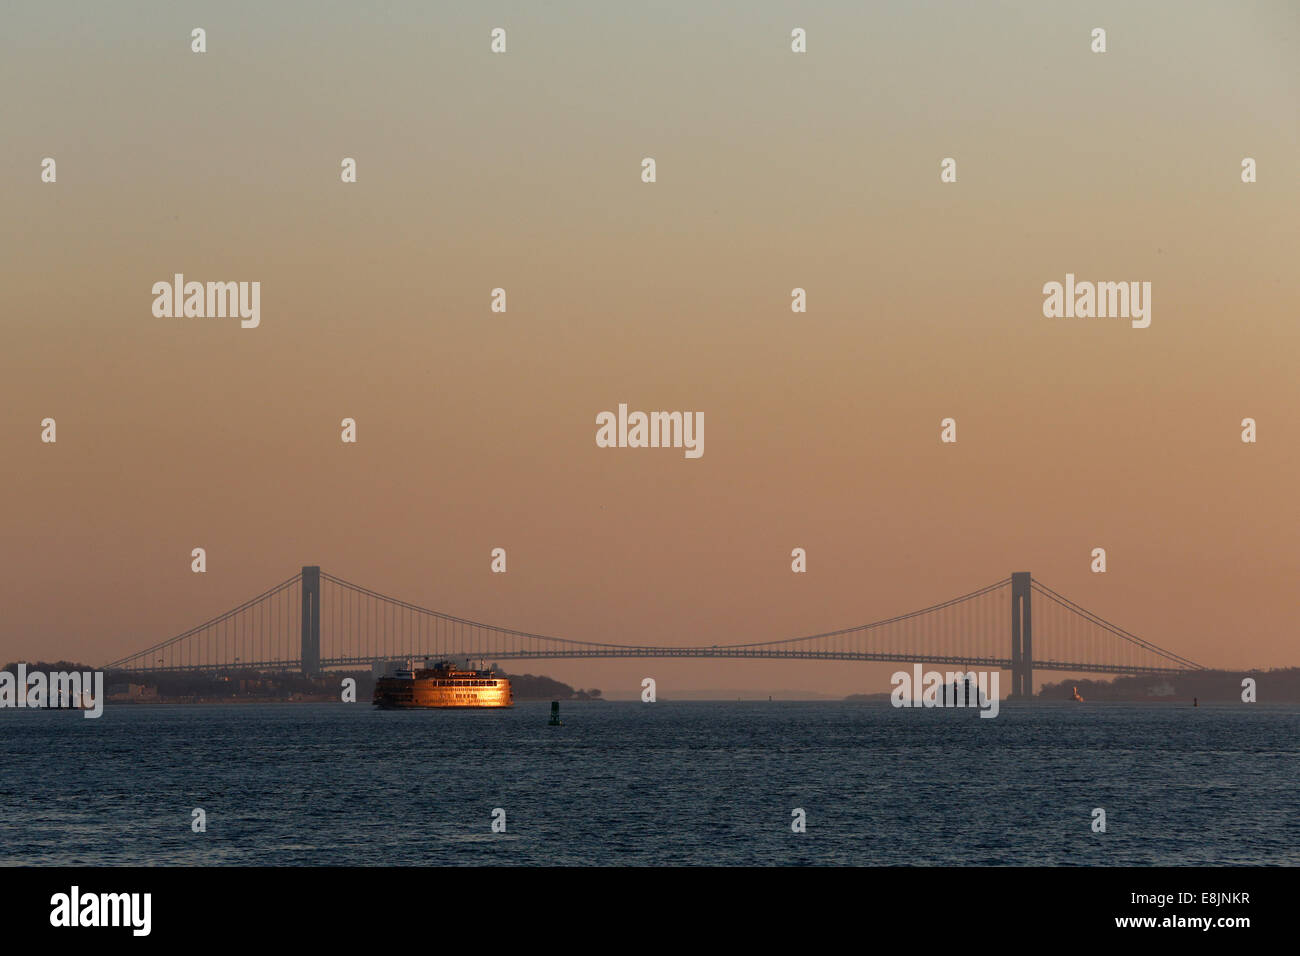 Ferry and Verrazano-Narrows Bridge Spanning Upper New York Bay. - Stock Image